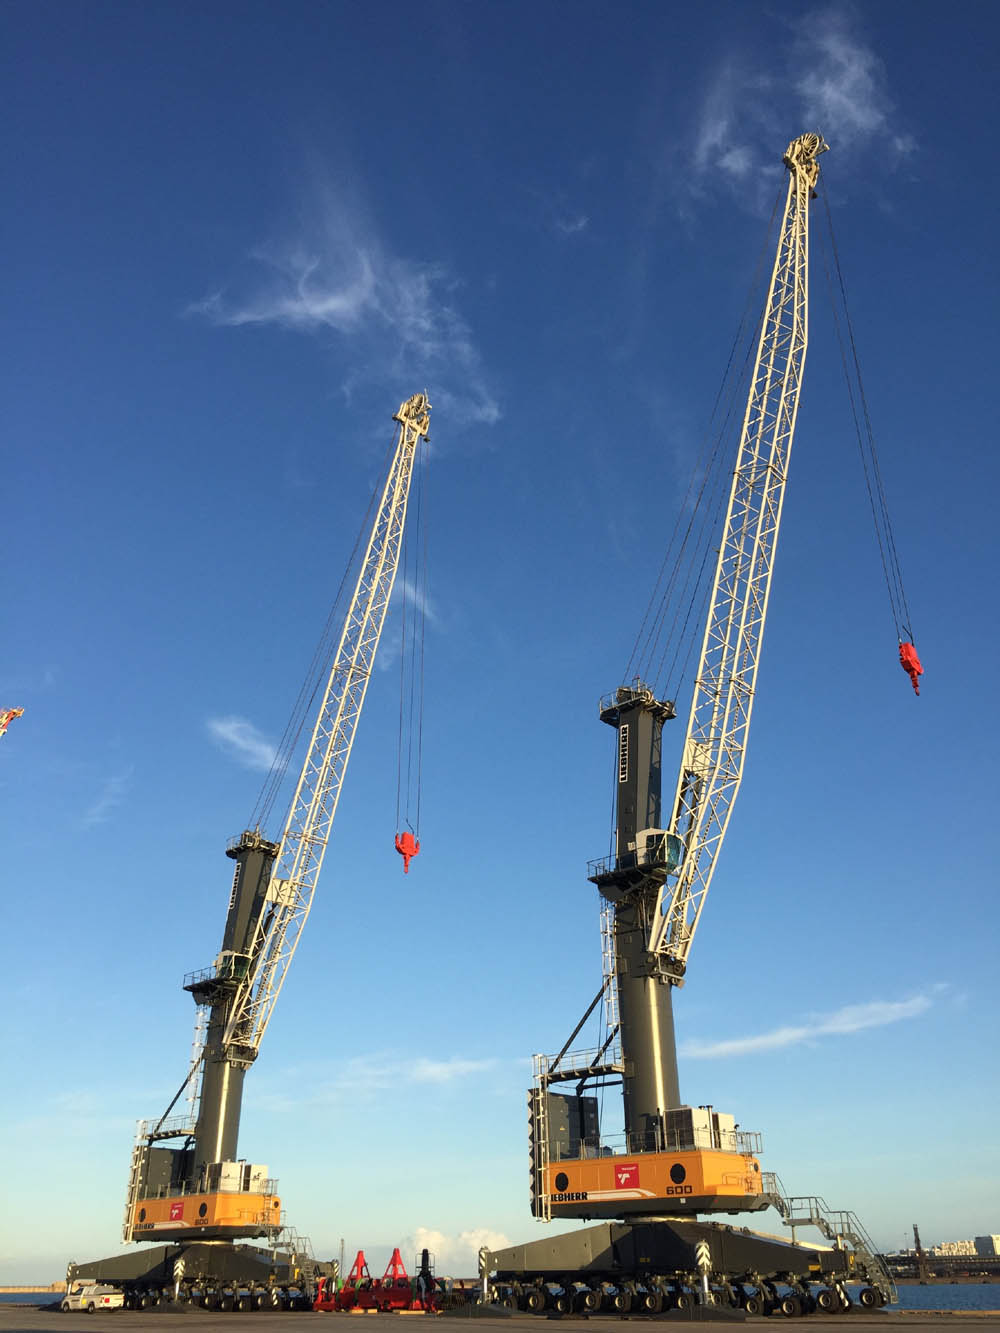 Multi-use LHM 600 pair arrive in Port Elizabeth